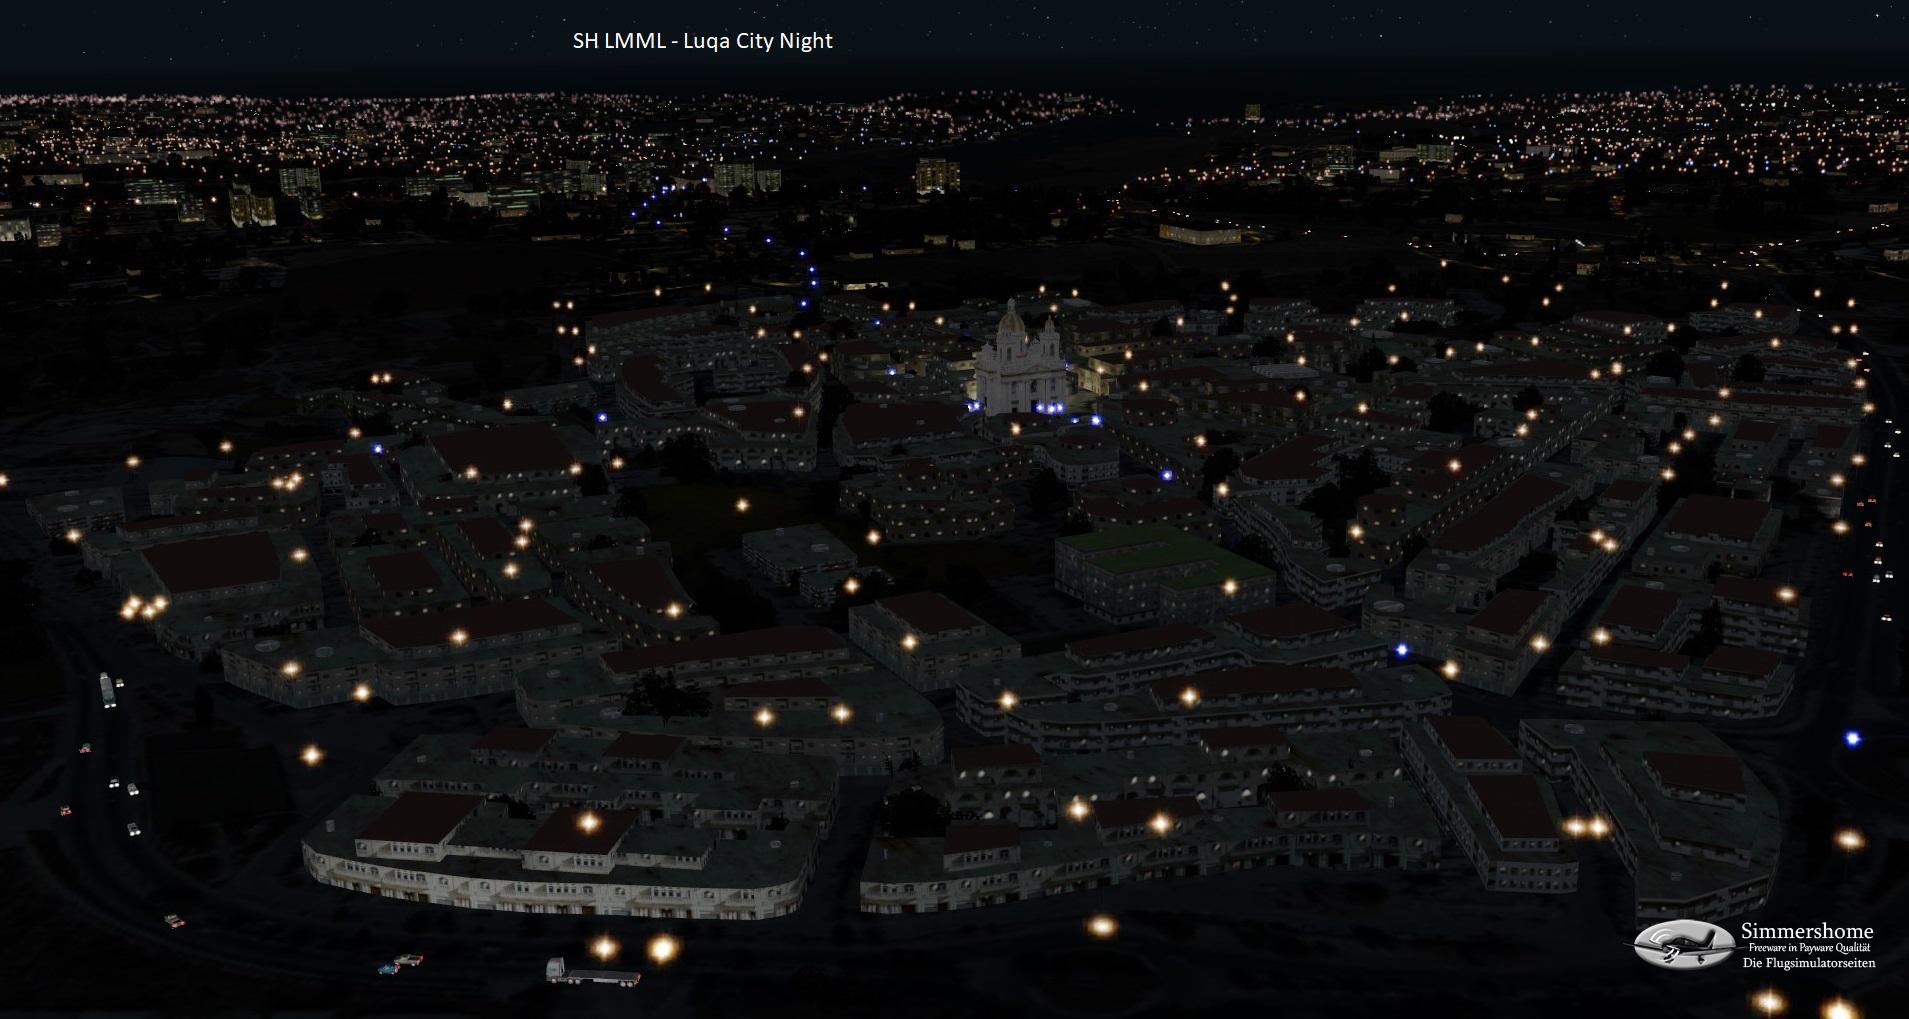 luqanight4cc5w.jpg